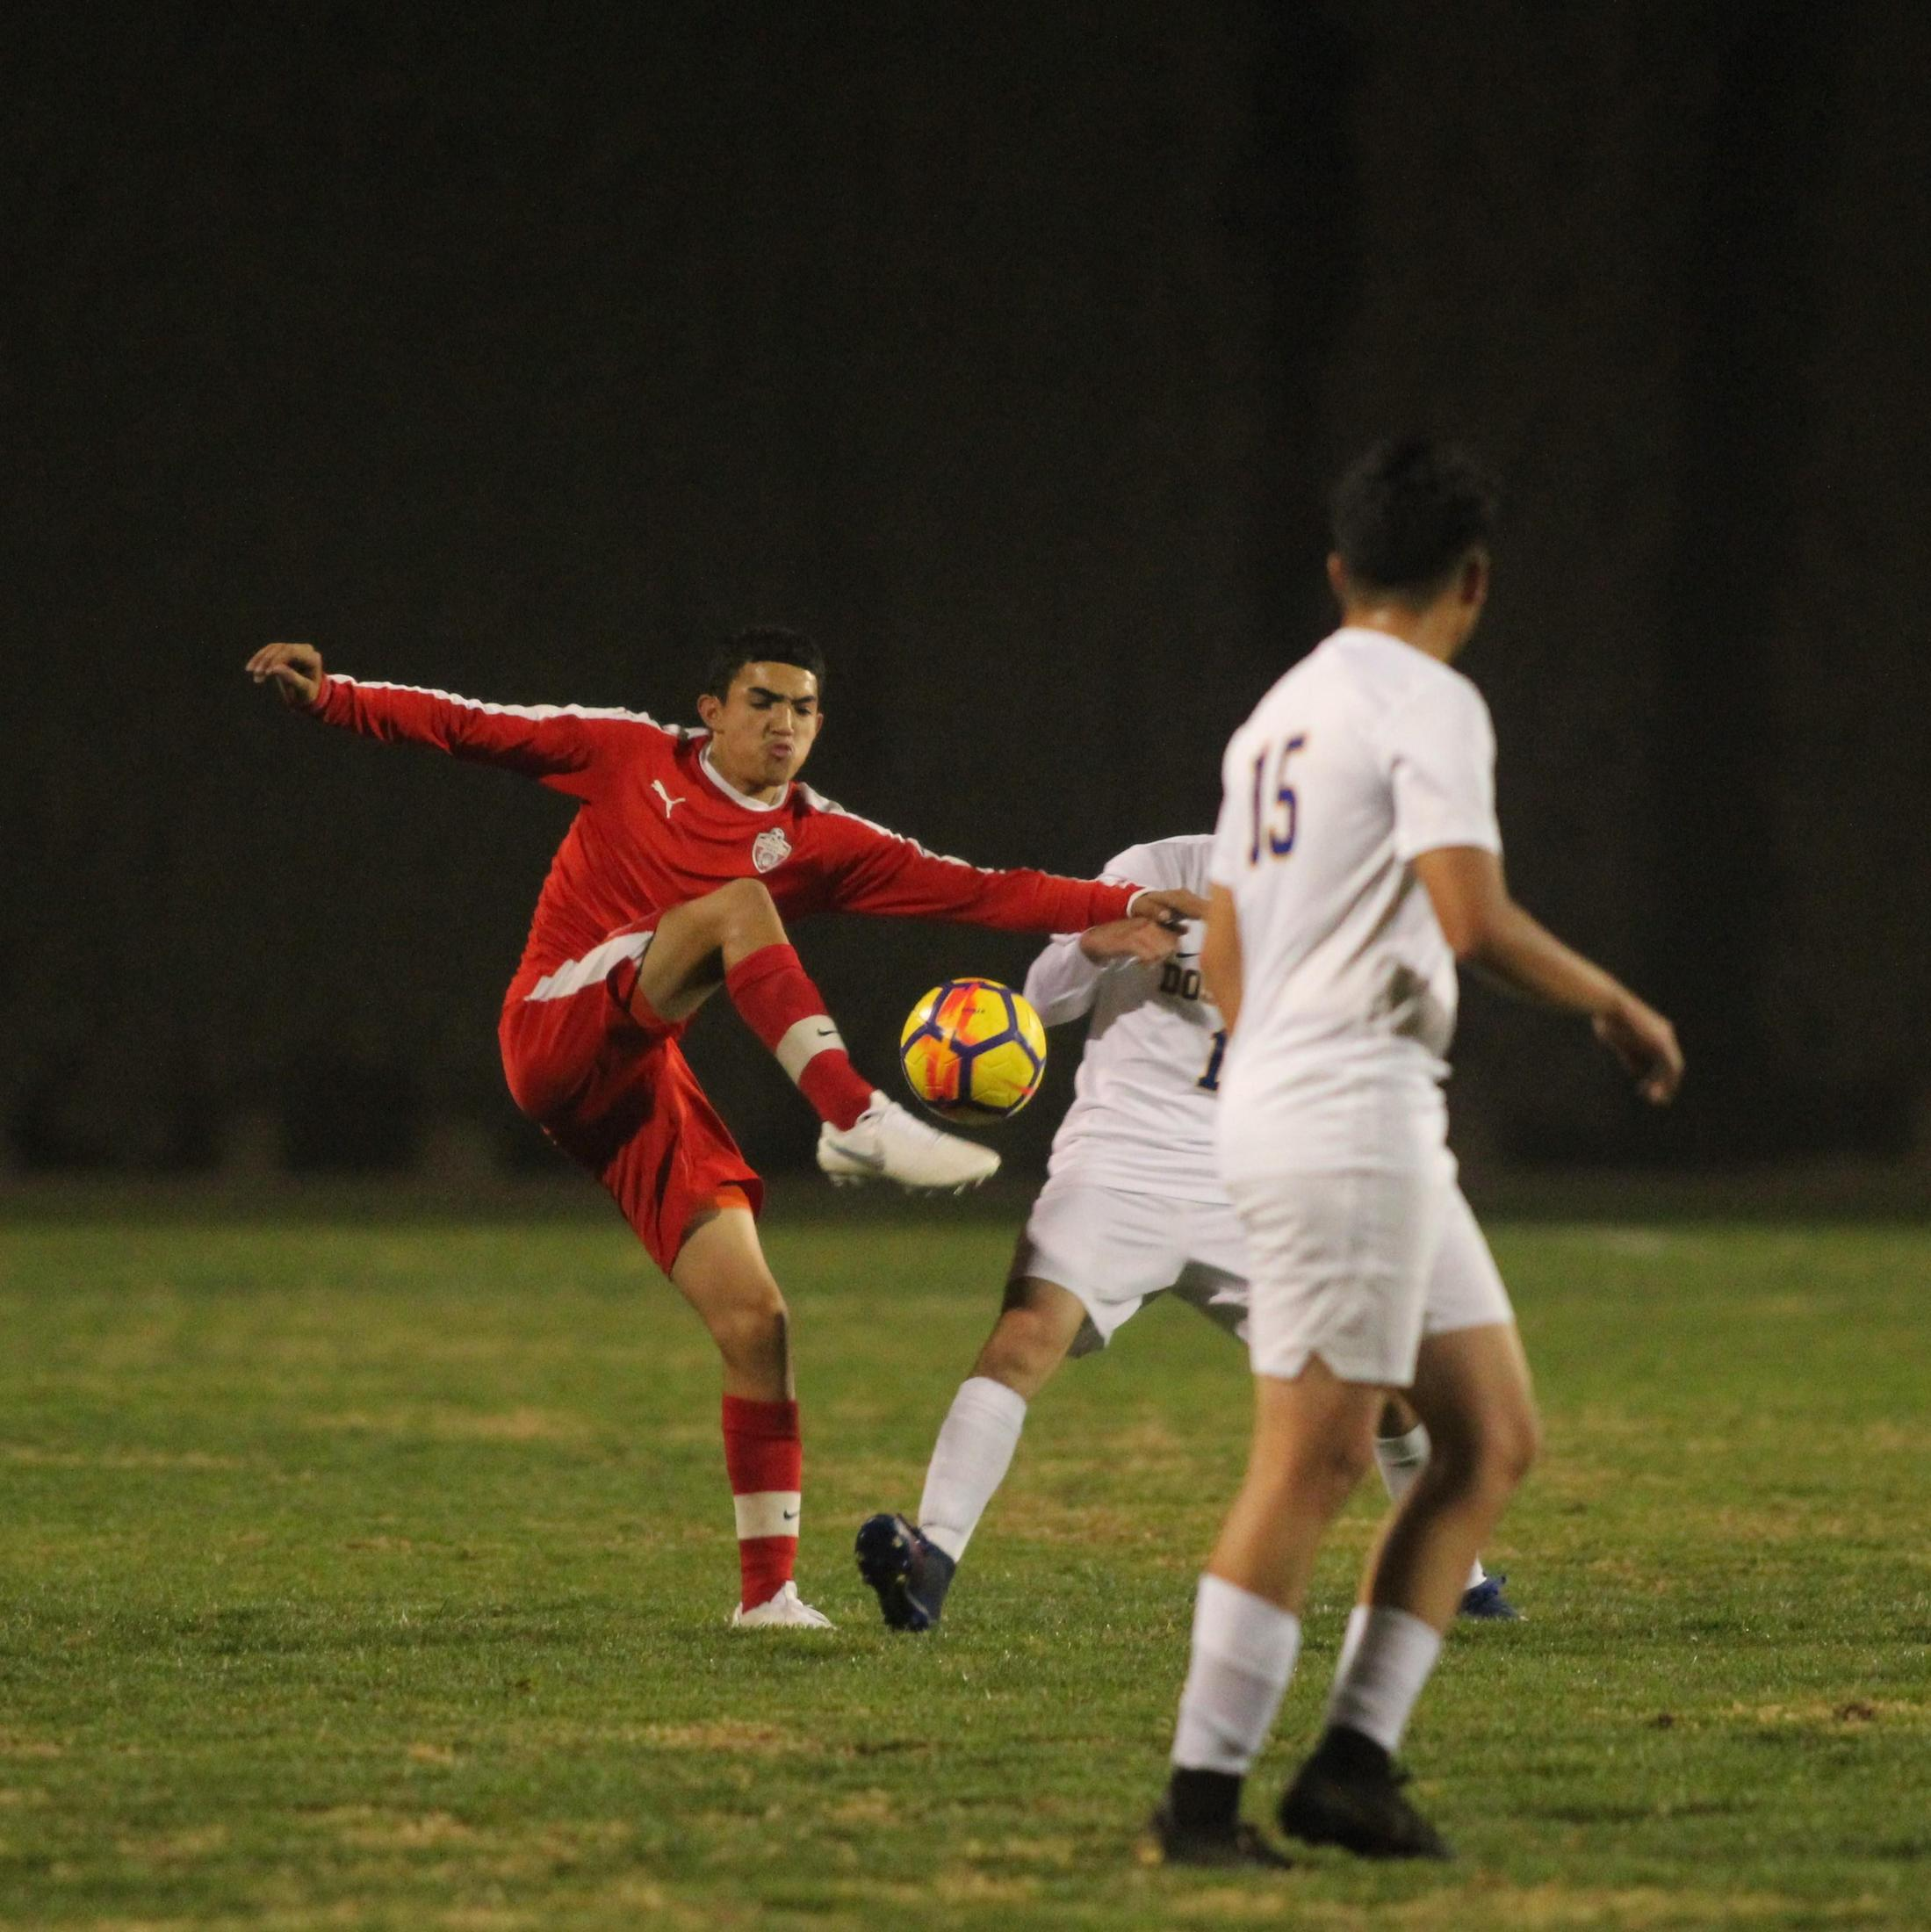 Edgar Campos kicking the ball